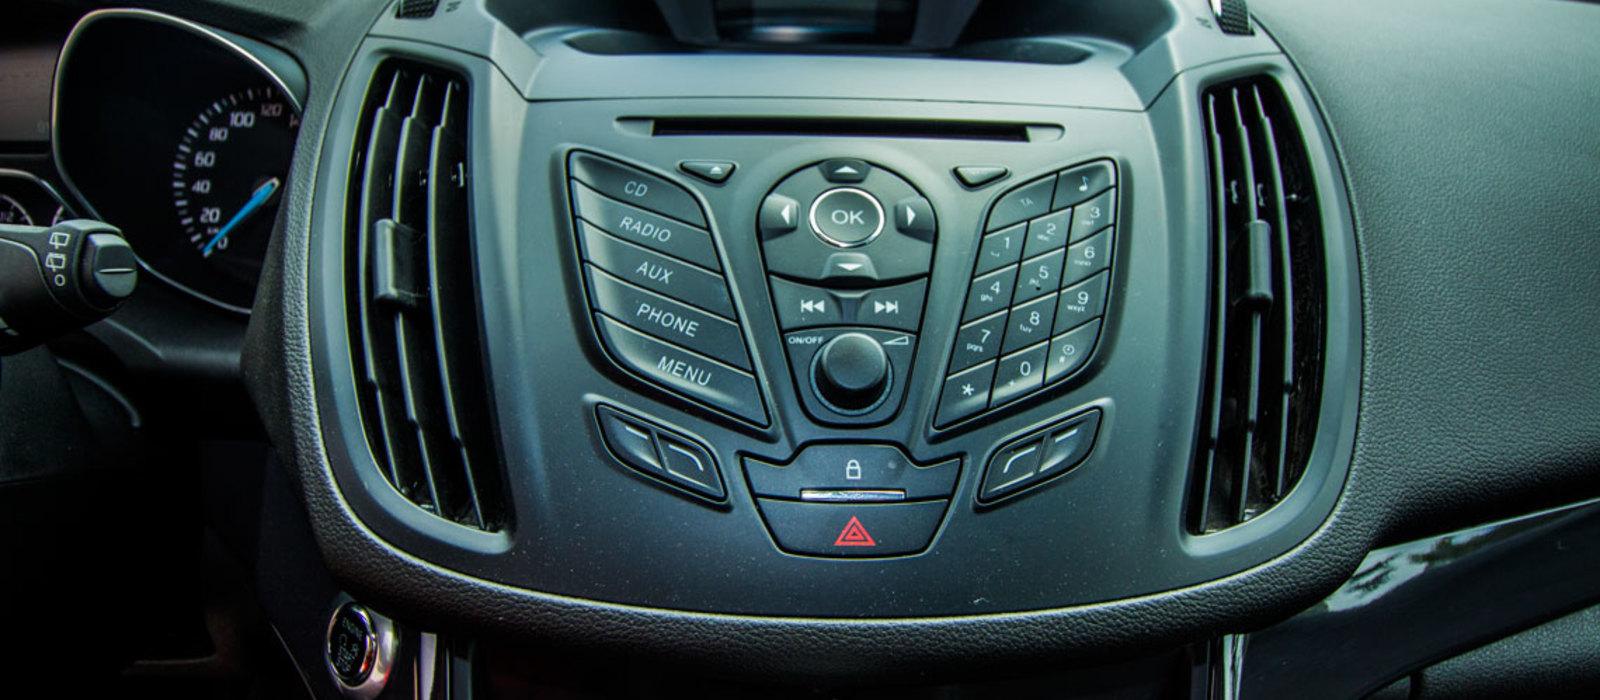 ikinci el araba 2014 Ford Kuga 1.6 EcoBoost Titanium Benzin Otomatik 14000 KM 12